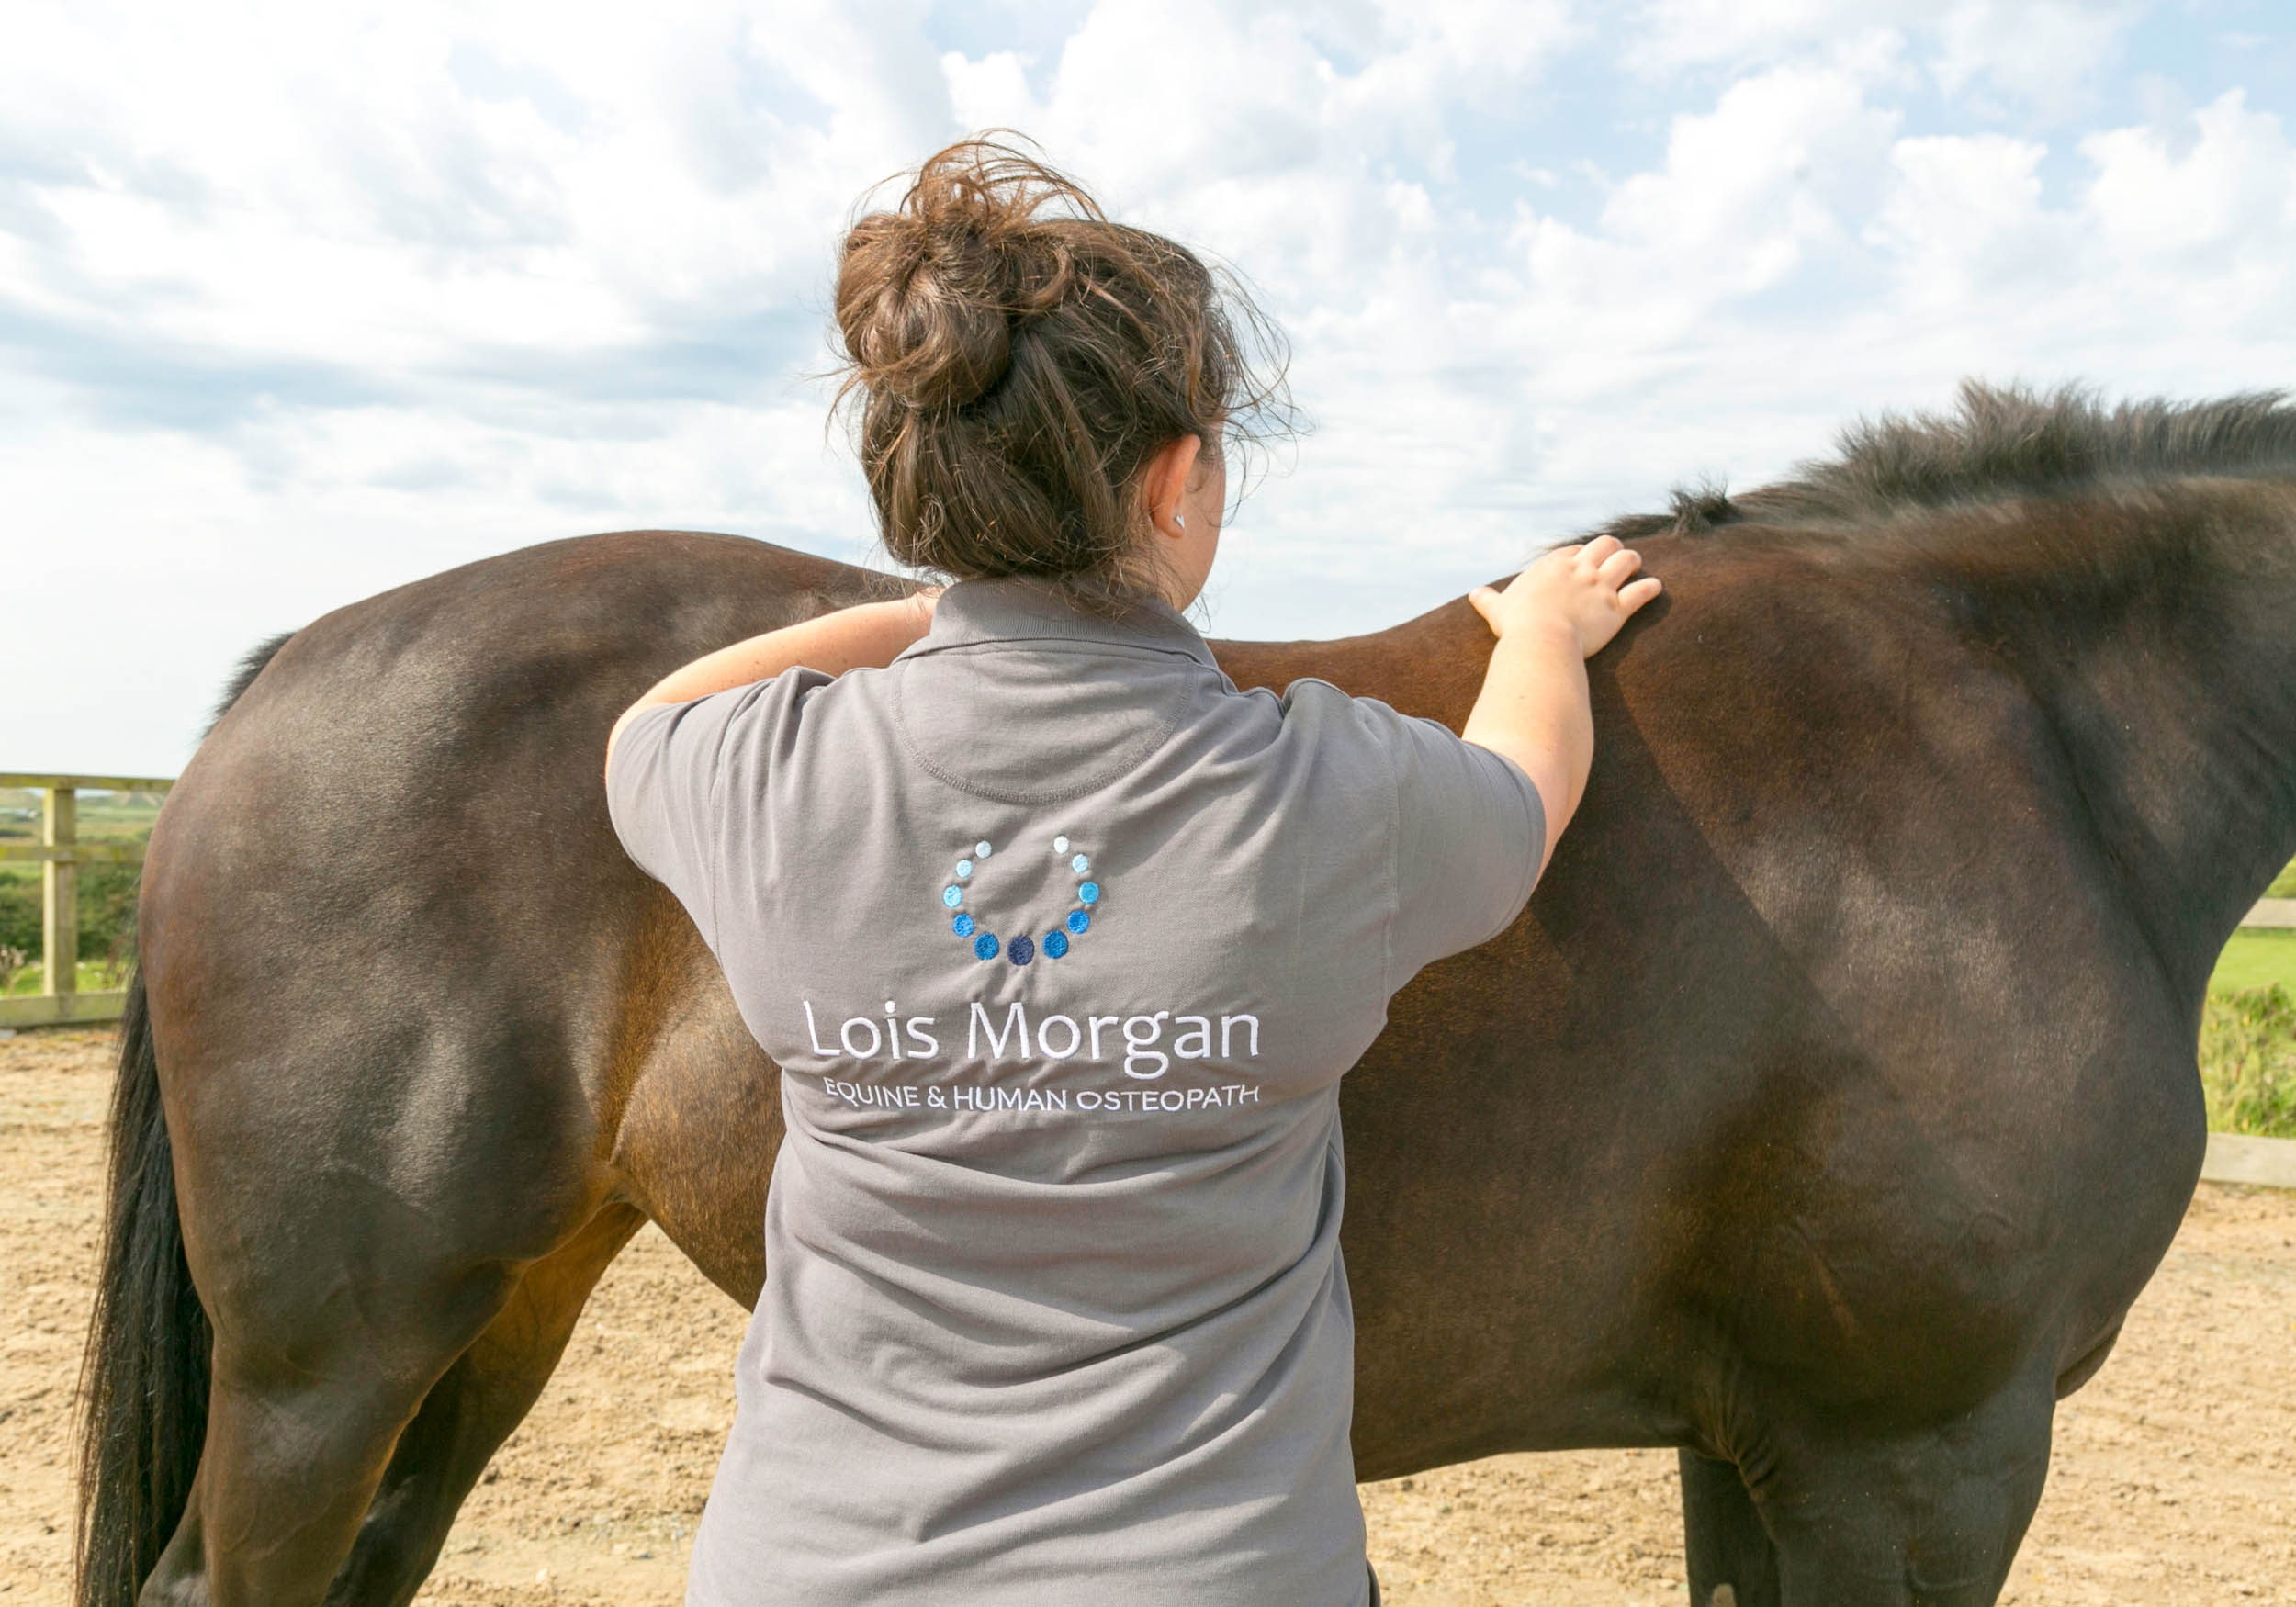 lois-morgan-equine-osteopath-Swansea